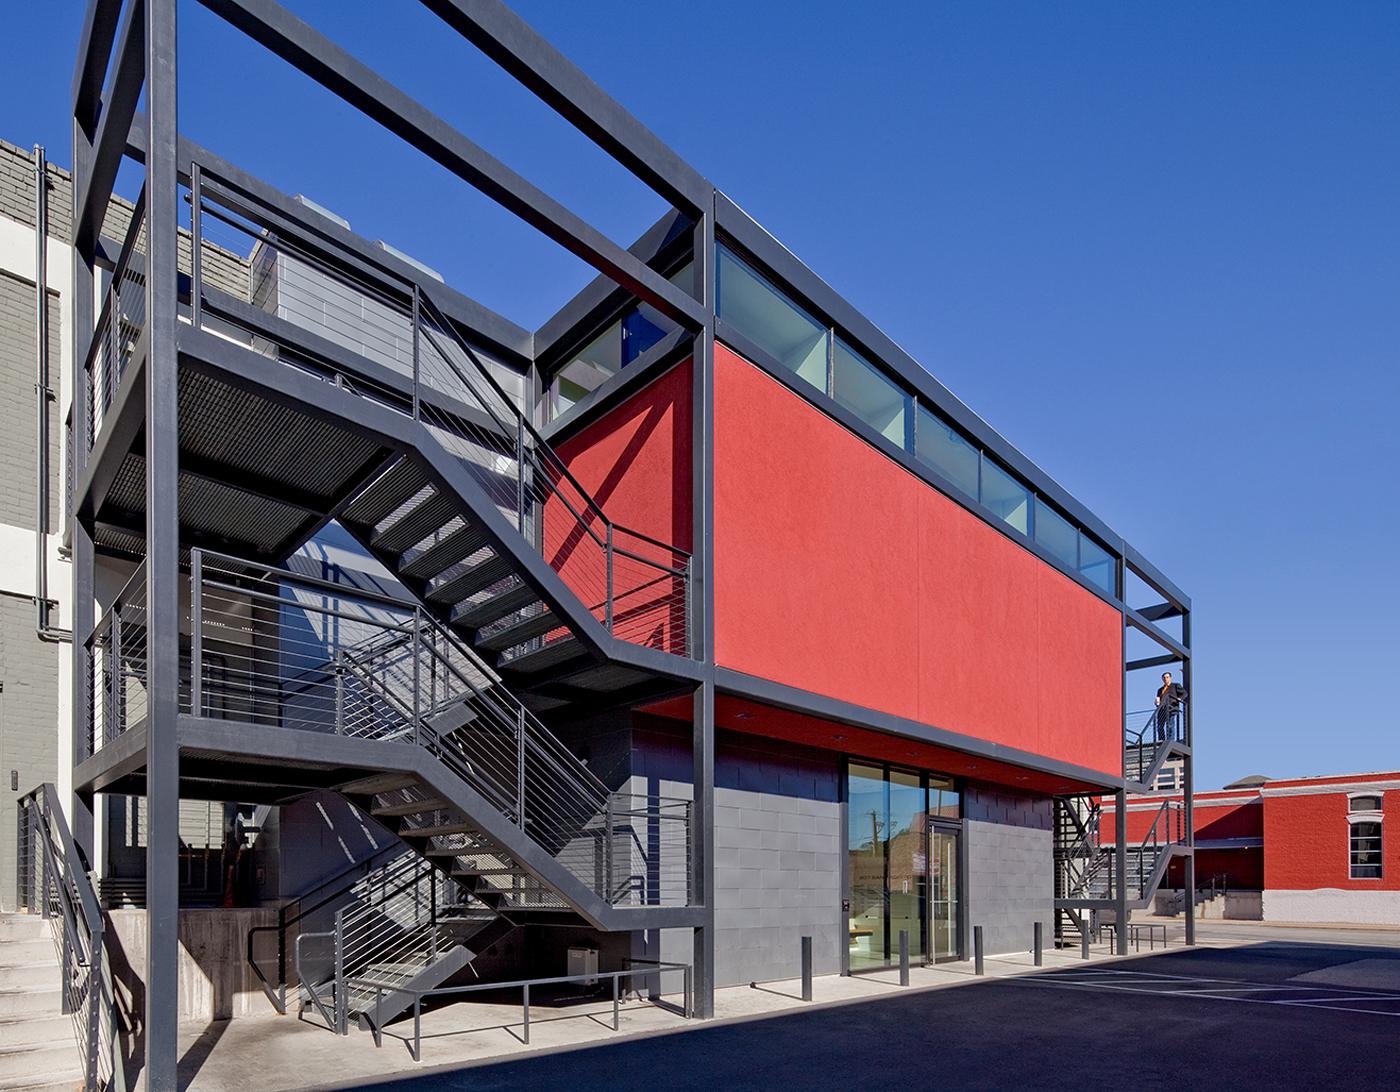 207 San Jacinto,Adaptive,re-use,renovation,Austin,texas,brett,wolfe,specht,harpman,warehouse,Office,Interior,restaurant,Mixed-Use